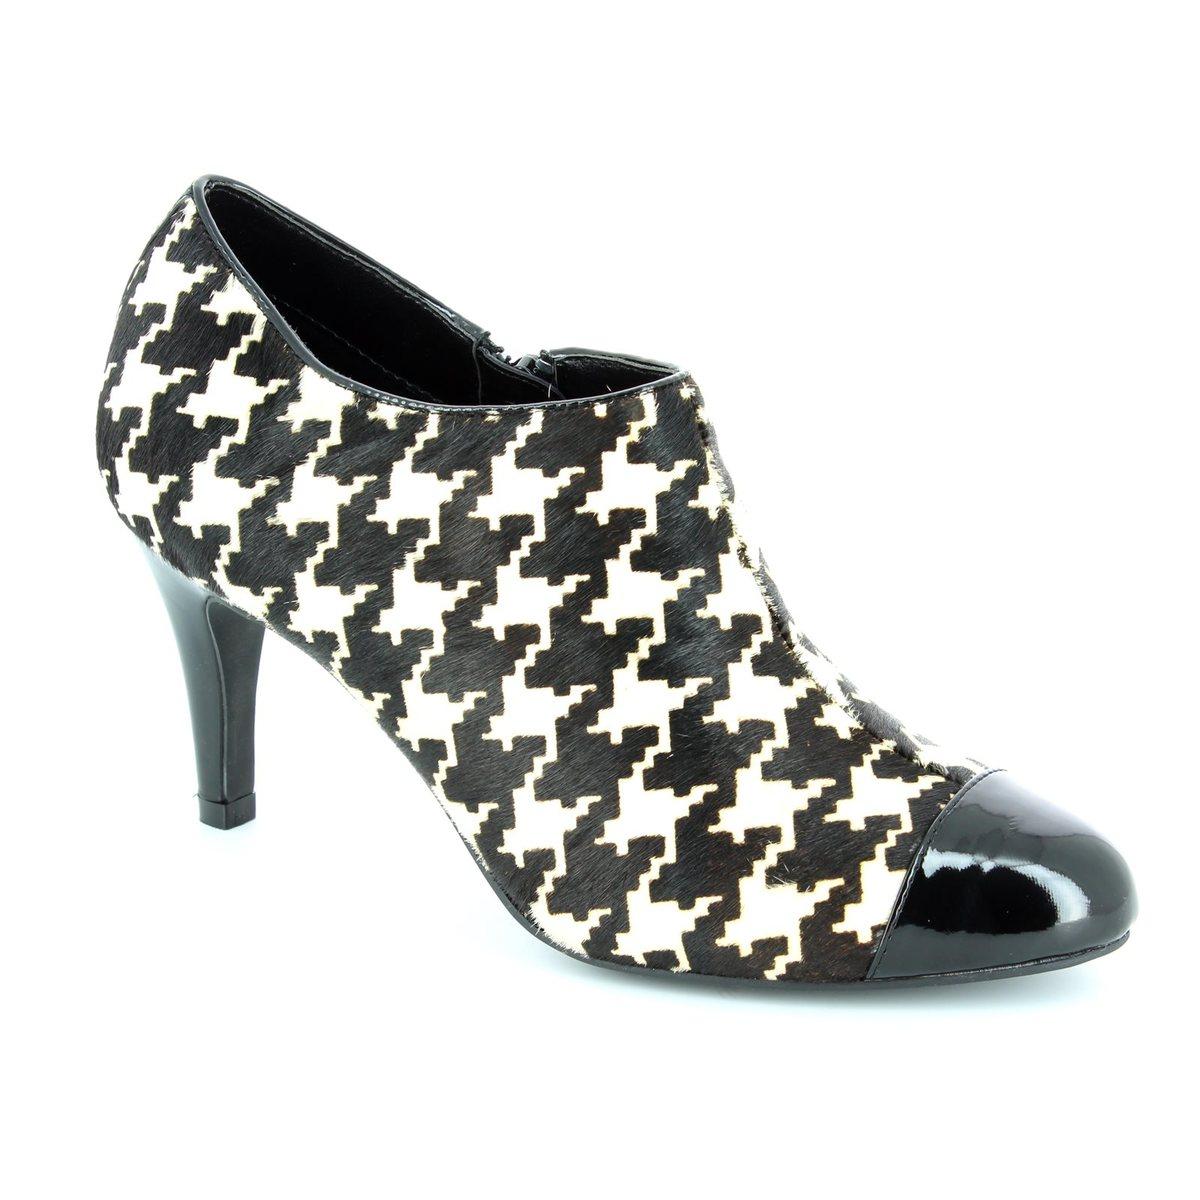 e0bcf5dfdb9 Lotus Ankle Boots - Black white - 50569 46 HANA